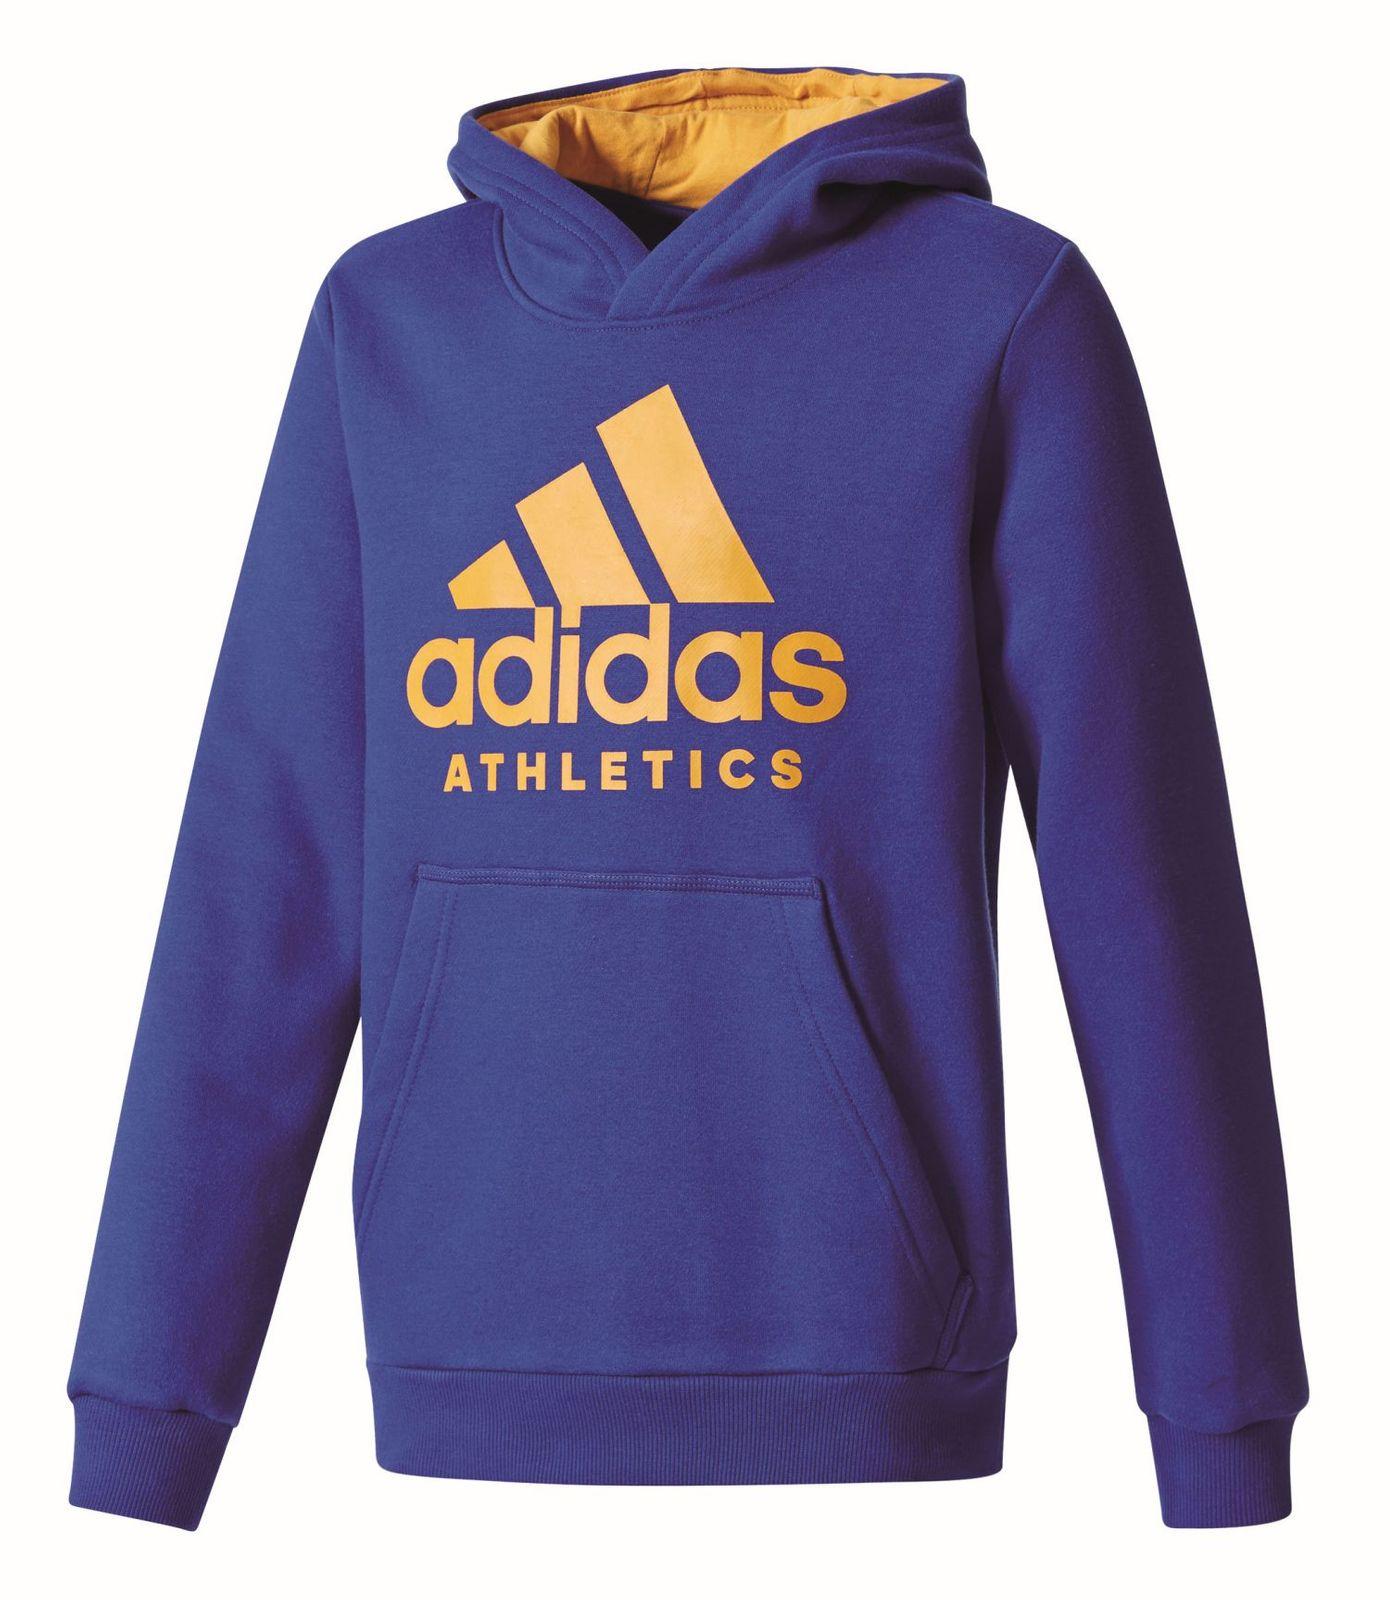 Details zu adidas Performance Kinder Pullover YB Ess 3S Iconic Full Zip Hoodie blau